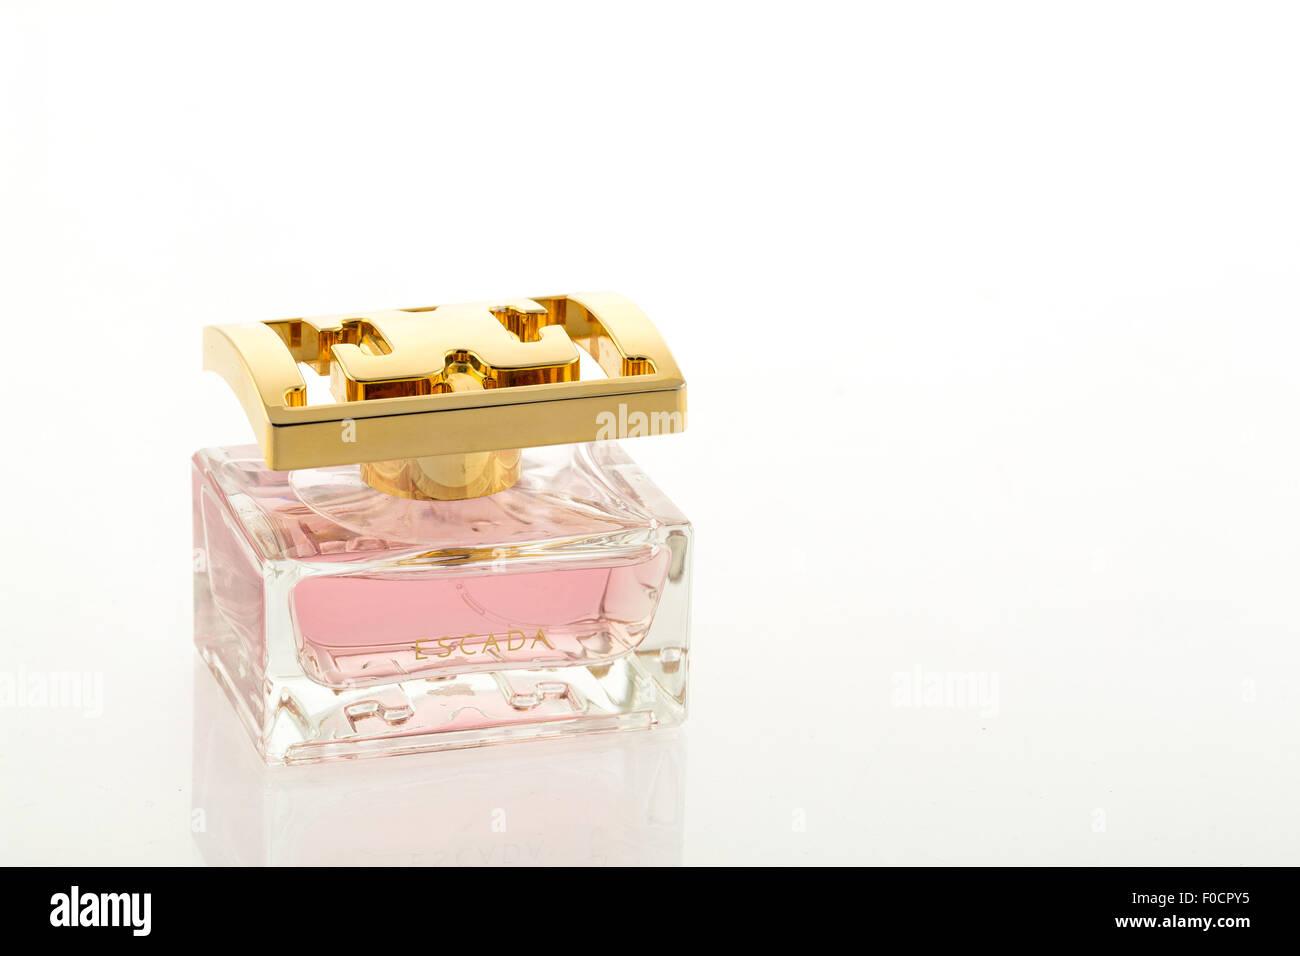 Escada perfume bottle - studio shot with a white background - Stock Image